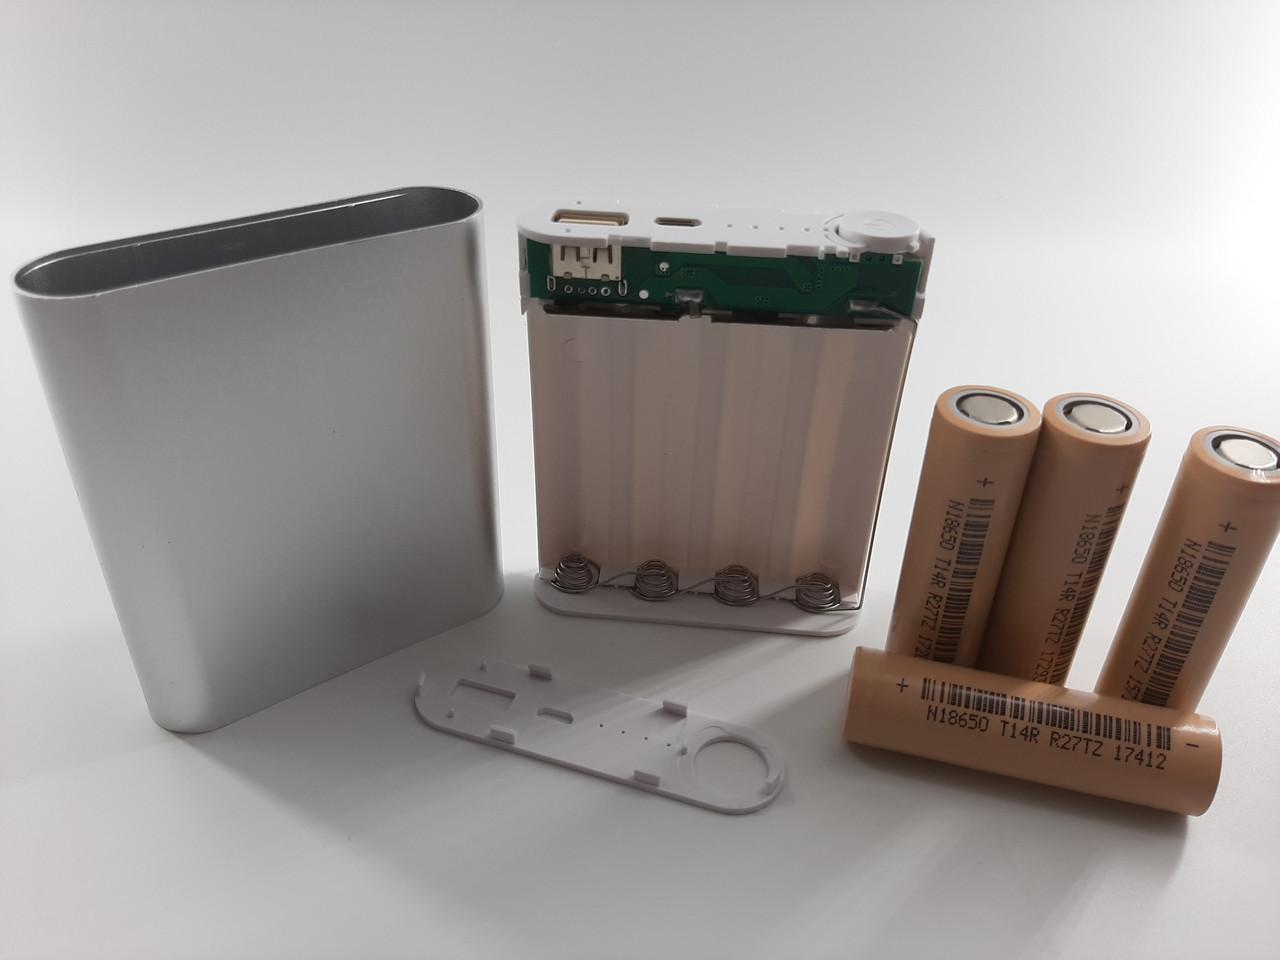 Корпус power bank. 5 В 1.0A бокс на 4X18650 в комплекте с аккумуляторами DLG 18650 2600 мА - 4 шт